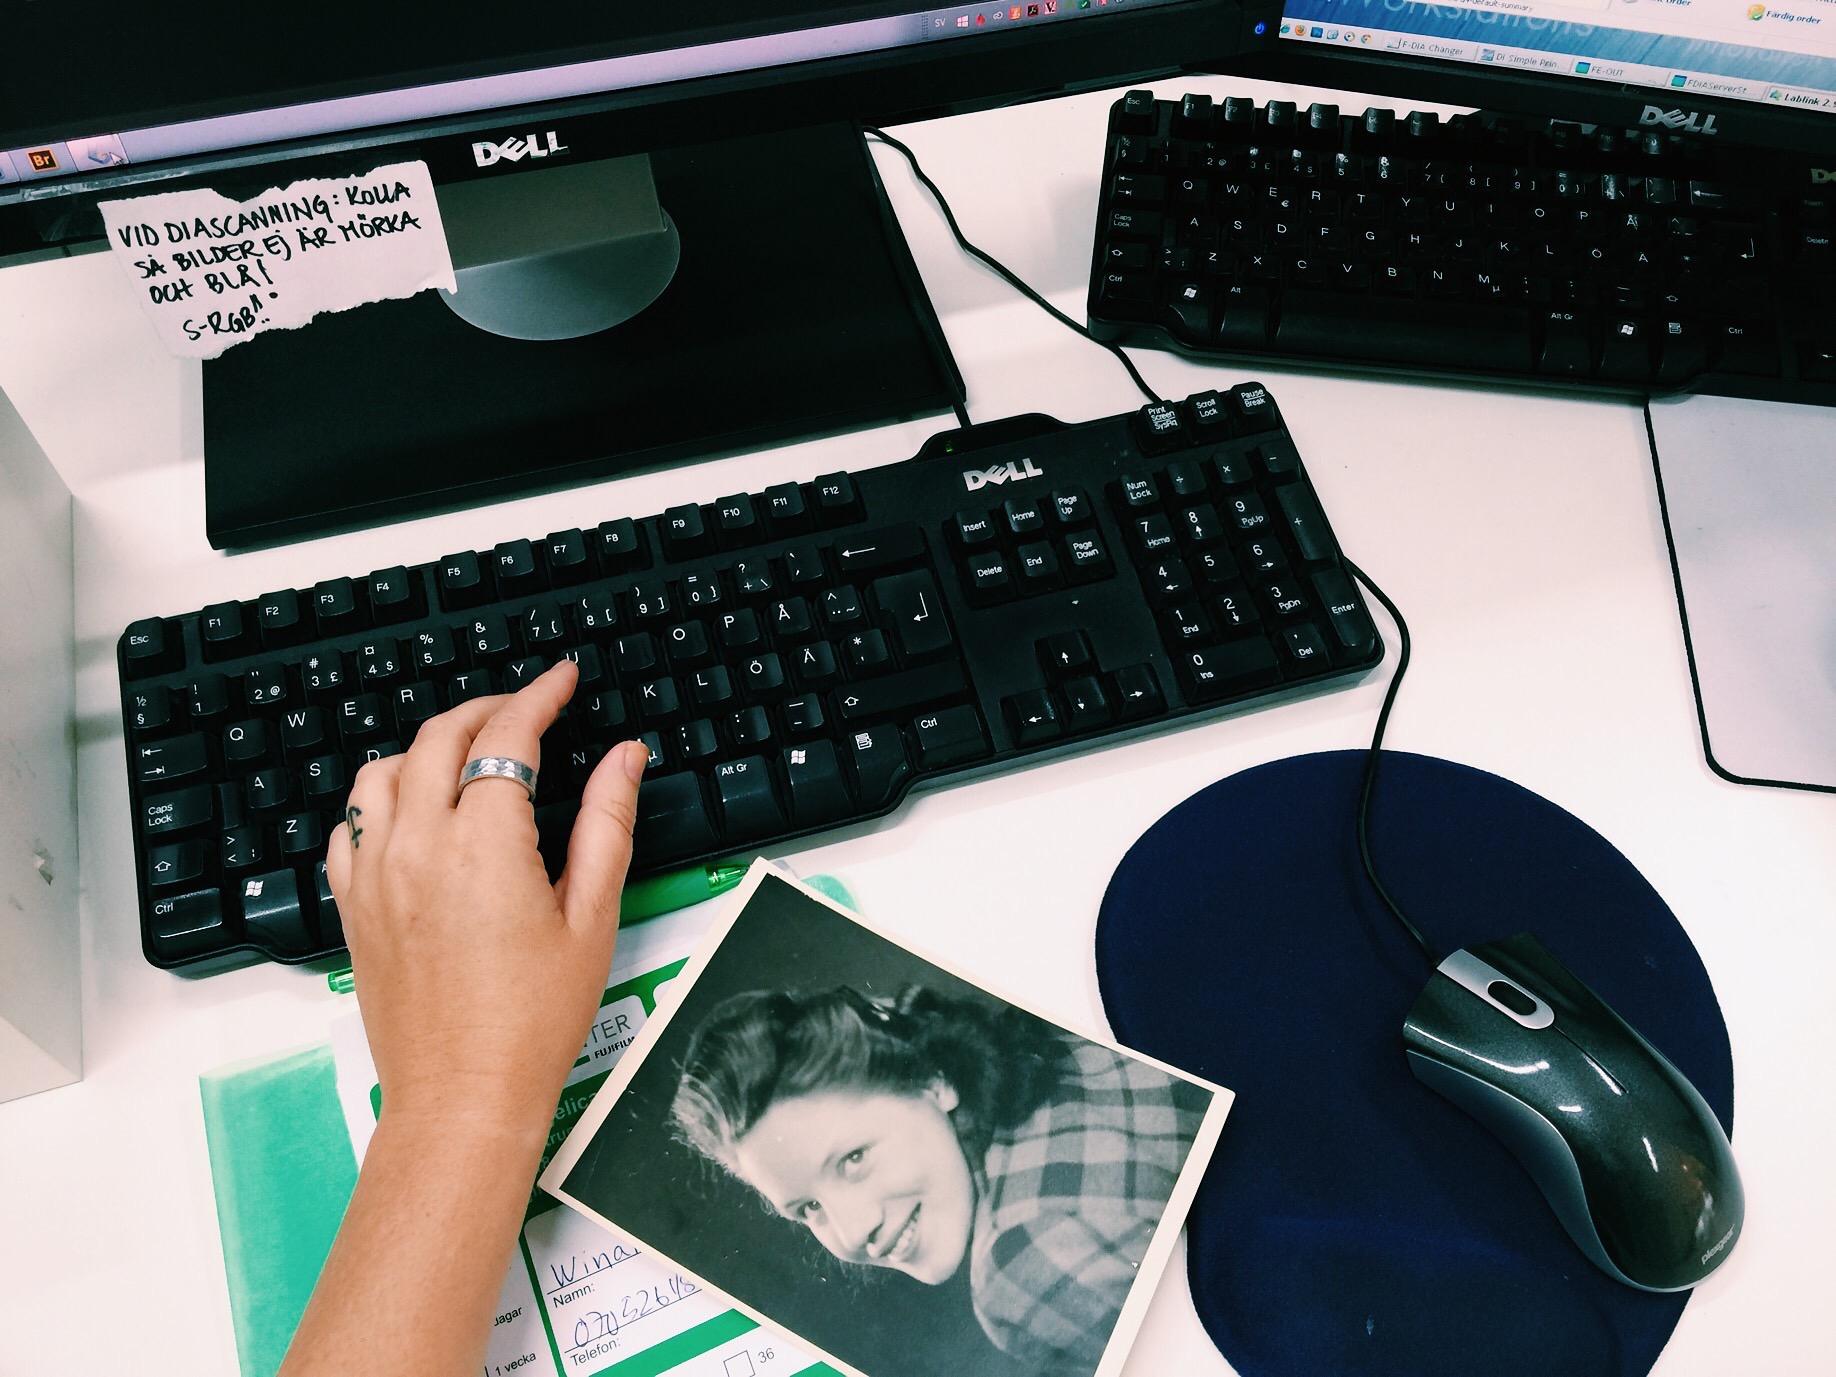 work computers